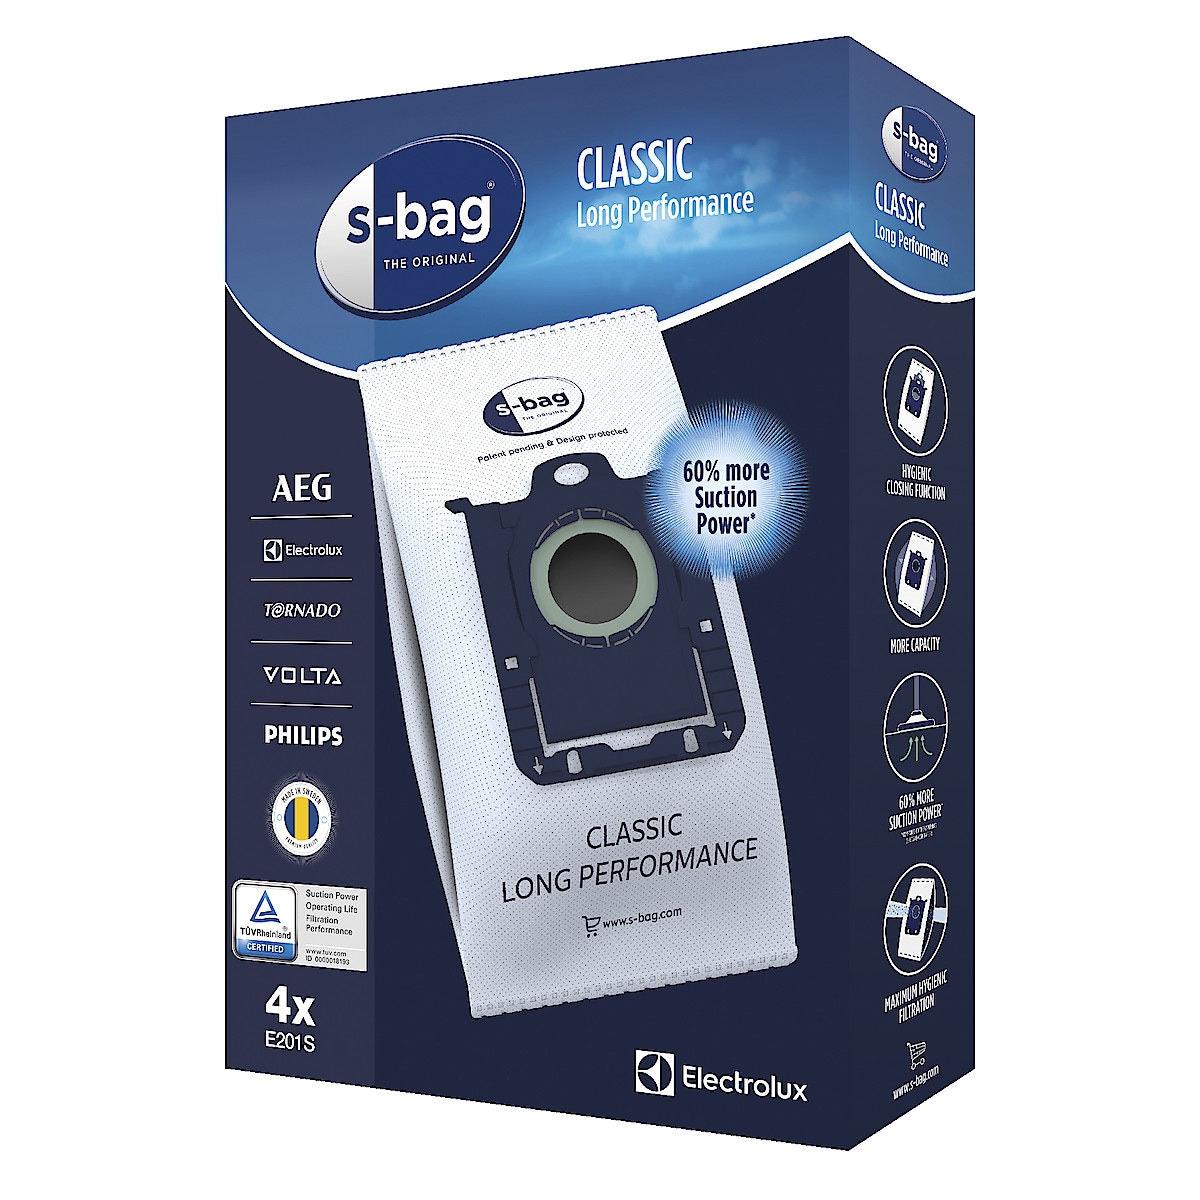 Staubsaugerbeutel S-bag Electrolux E201S, 4er-Pack